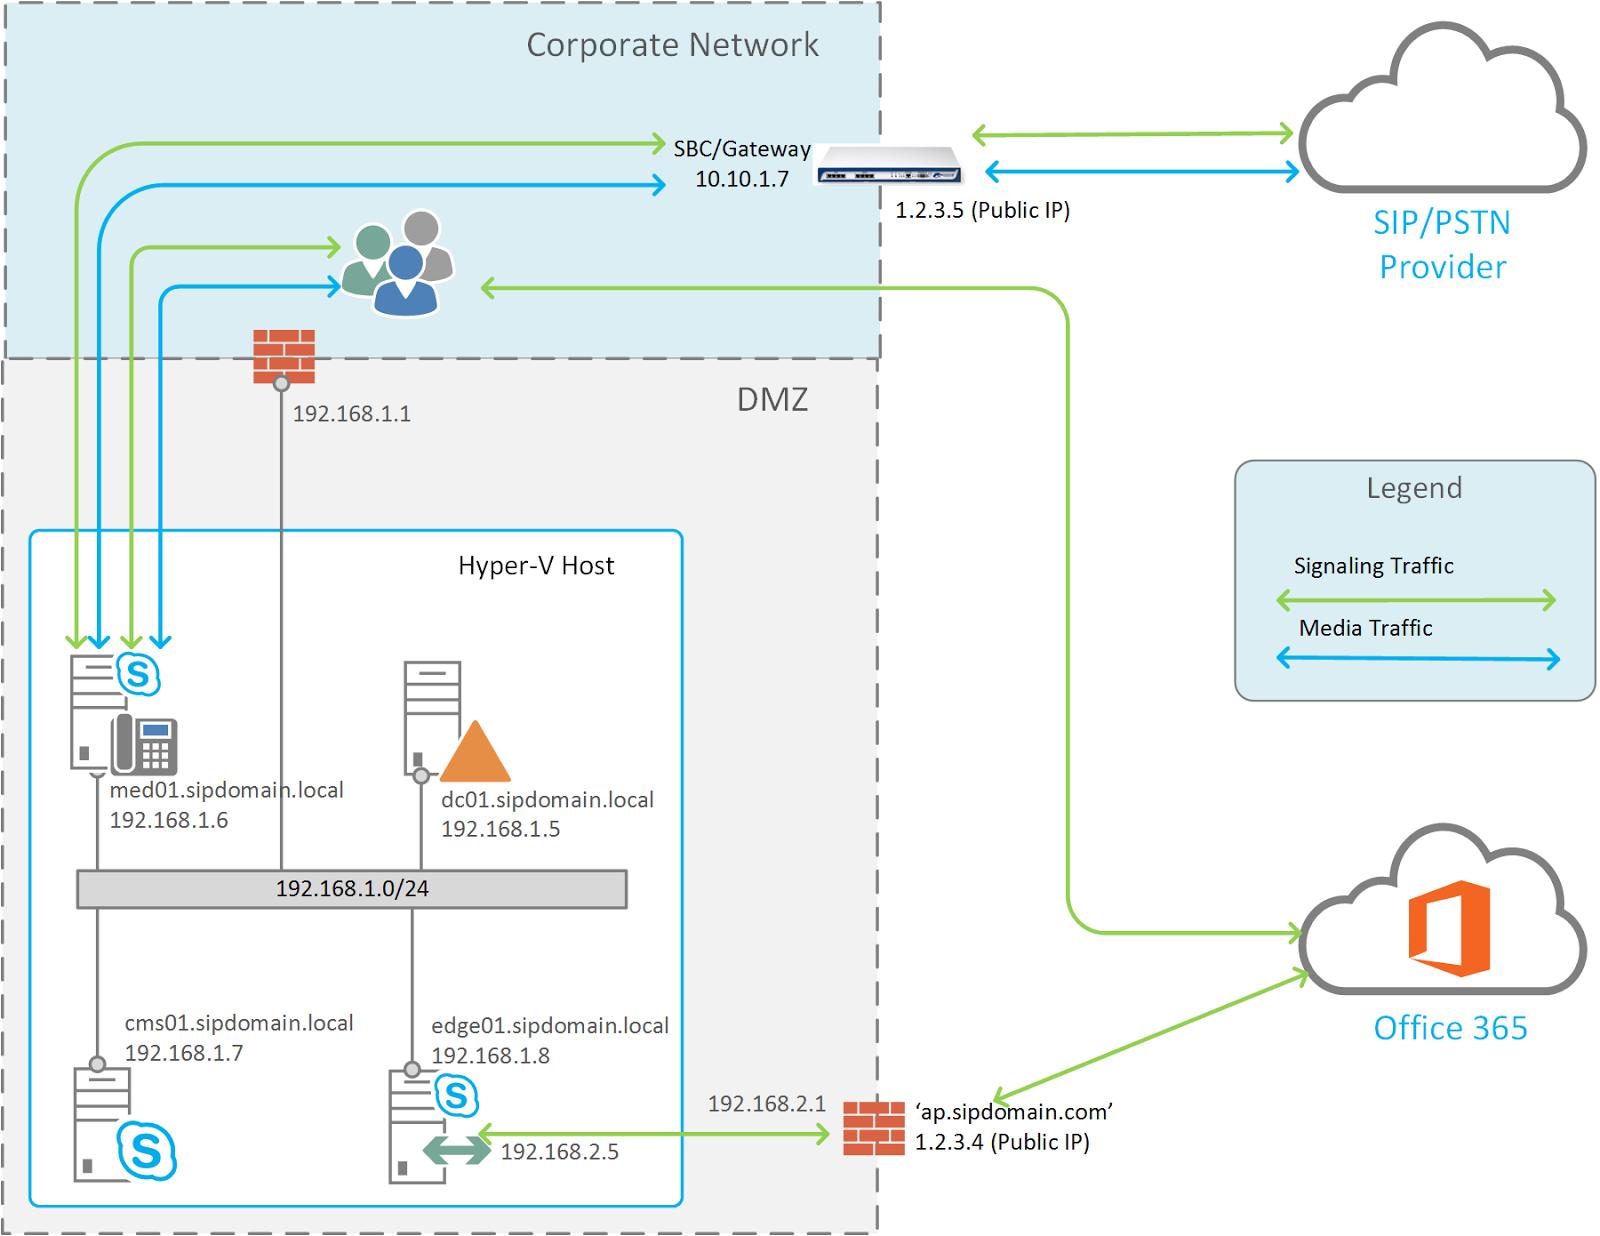 Pstn Call Flow Diagram Nema 14 30 Wiring  Gtget Csjosh Blog Cloud Connector Edition Cce